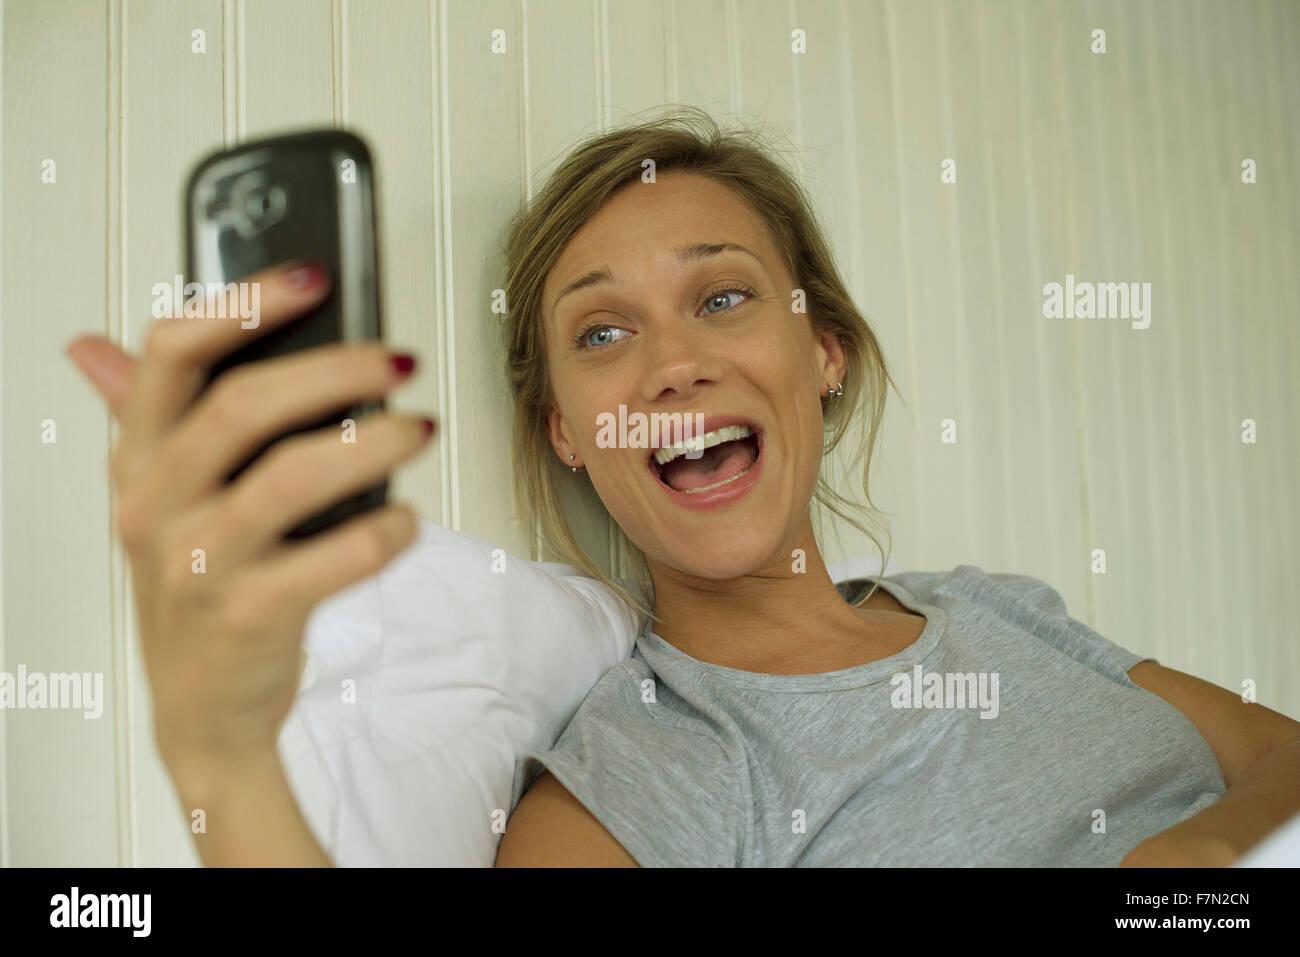 Frau, Lächeln, wobei selfie Stockbild